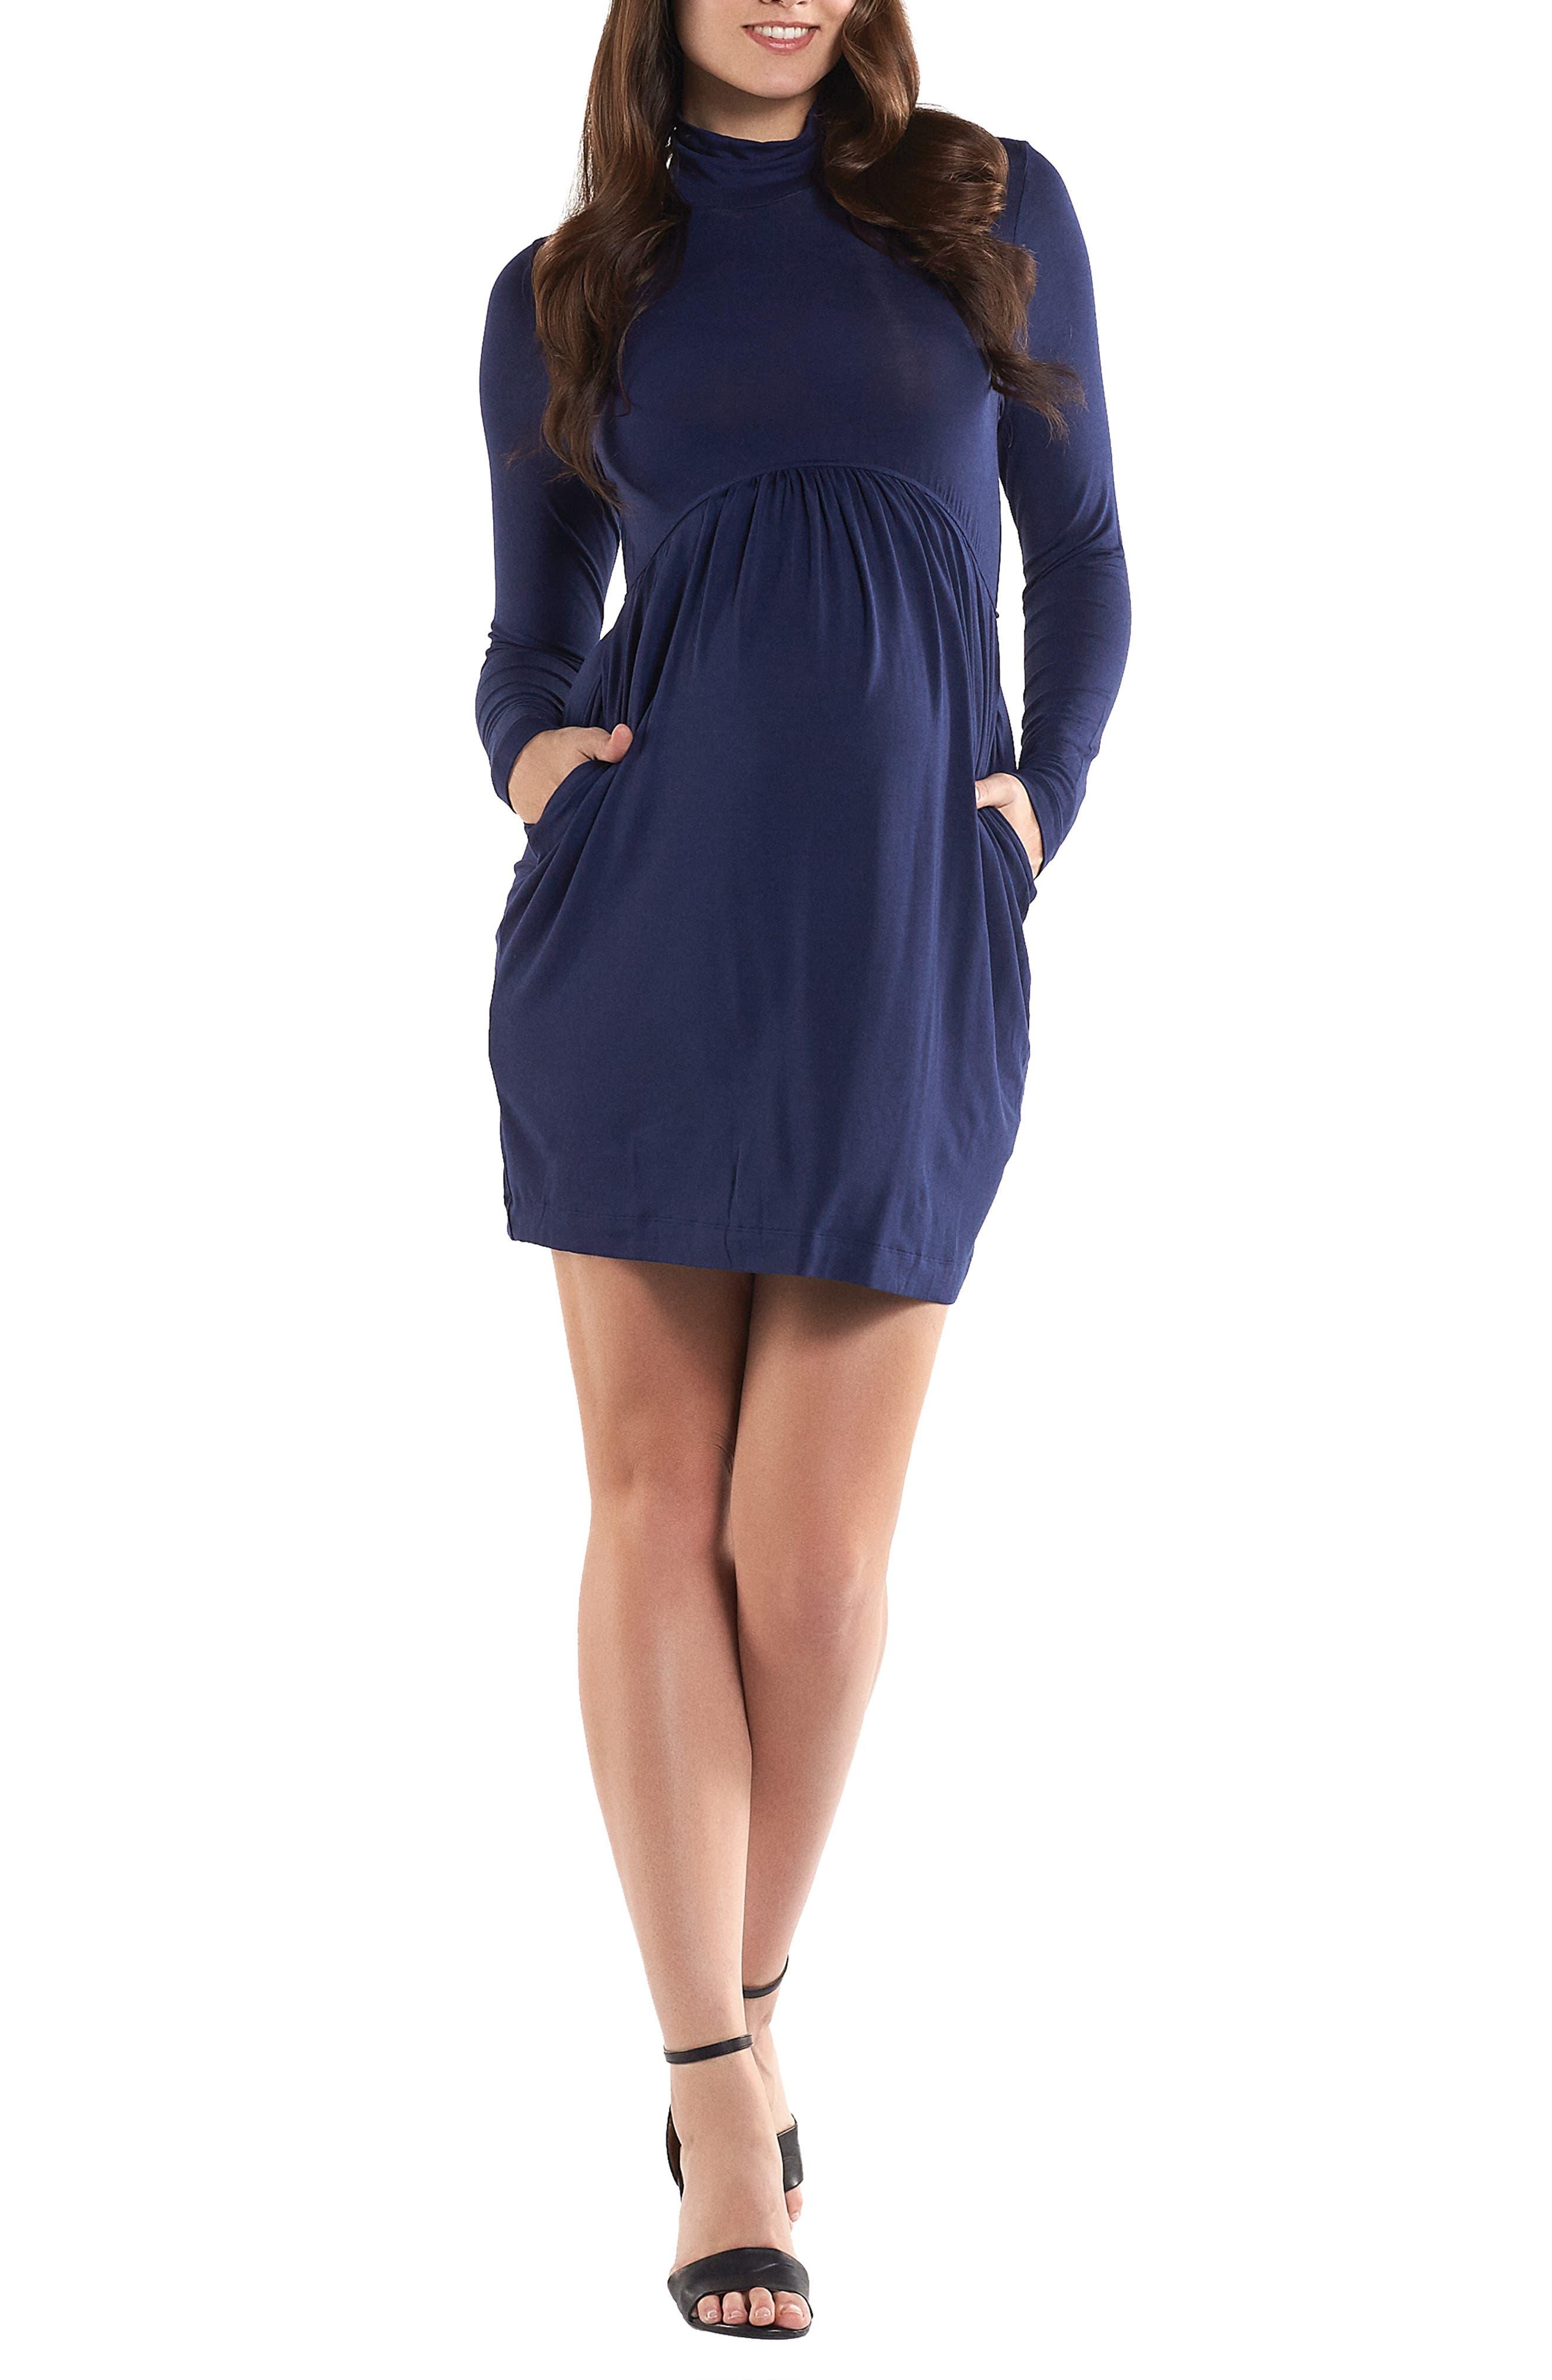 TART MATERNITY 'Rhiannon' Turtleneck Fit & Flare Maternity Dress, Main, color, PEACOAT